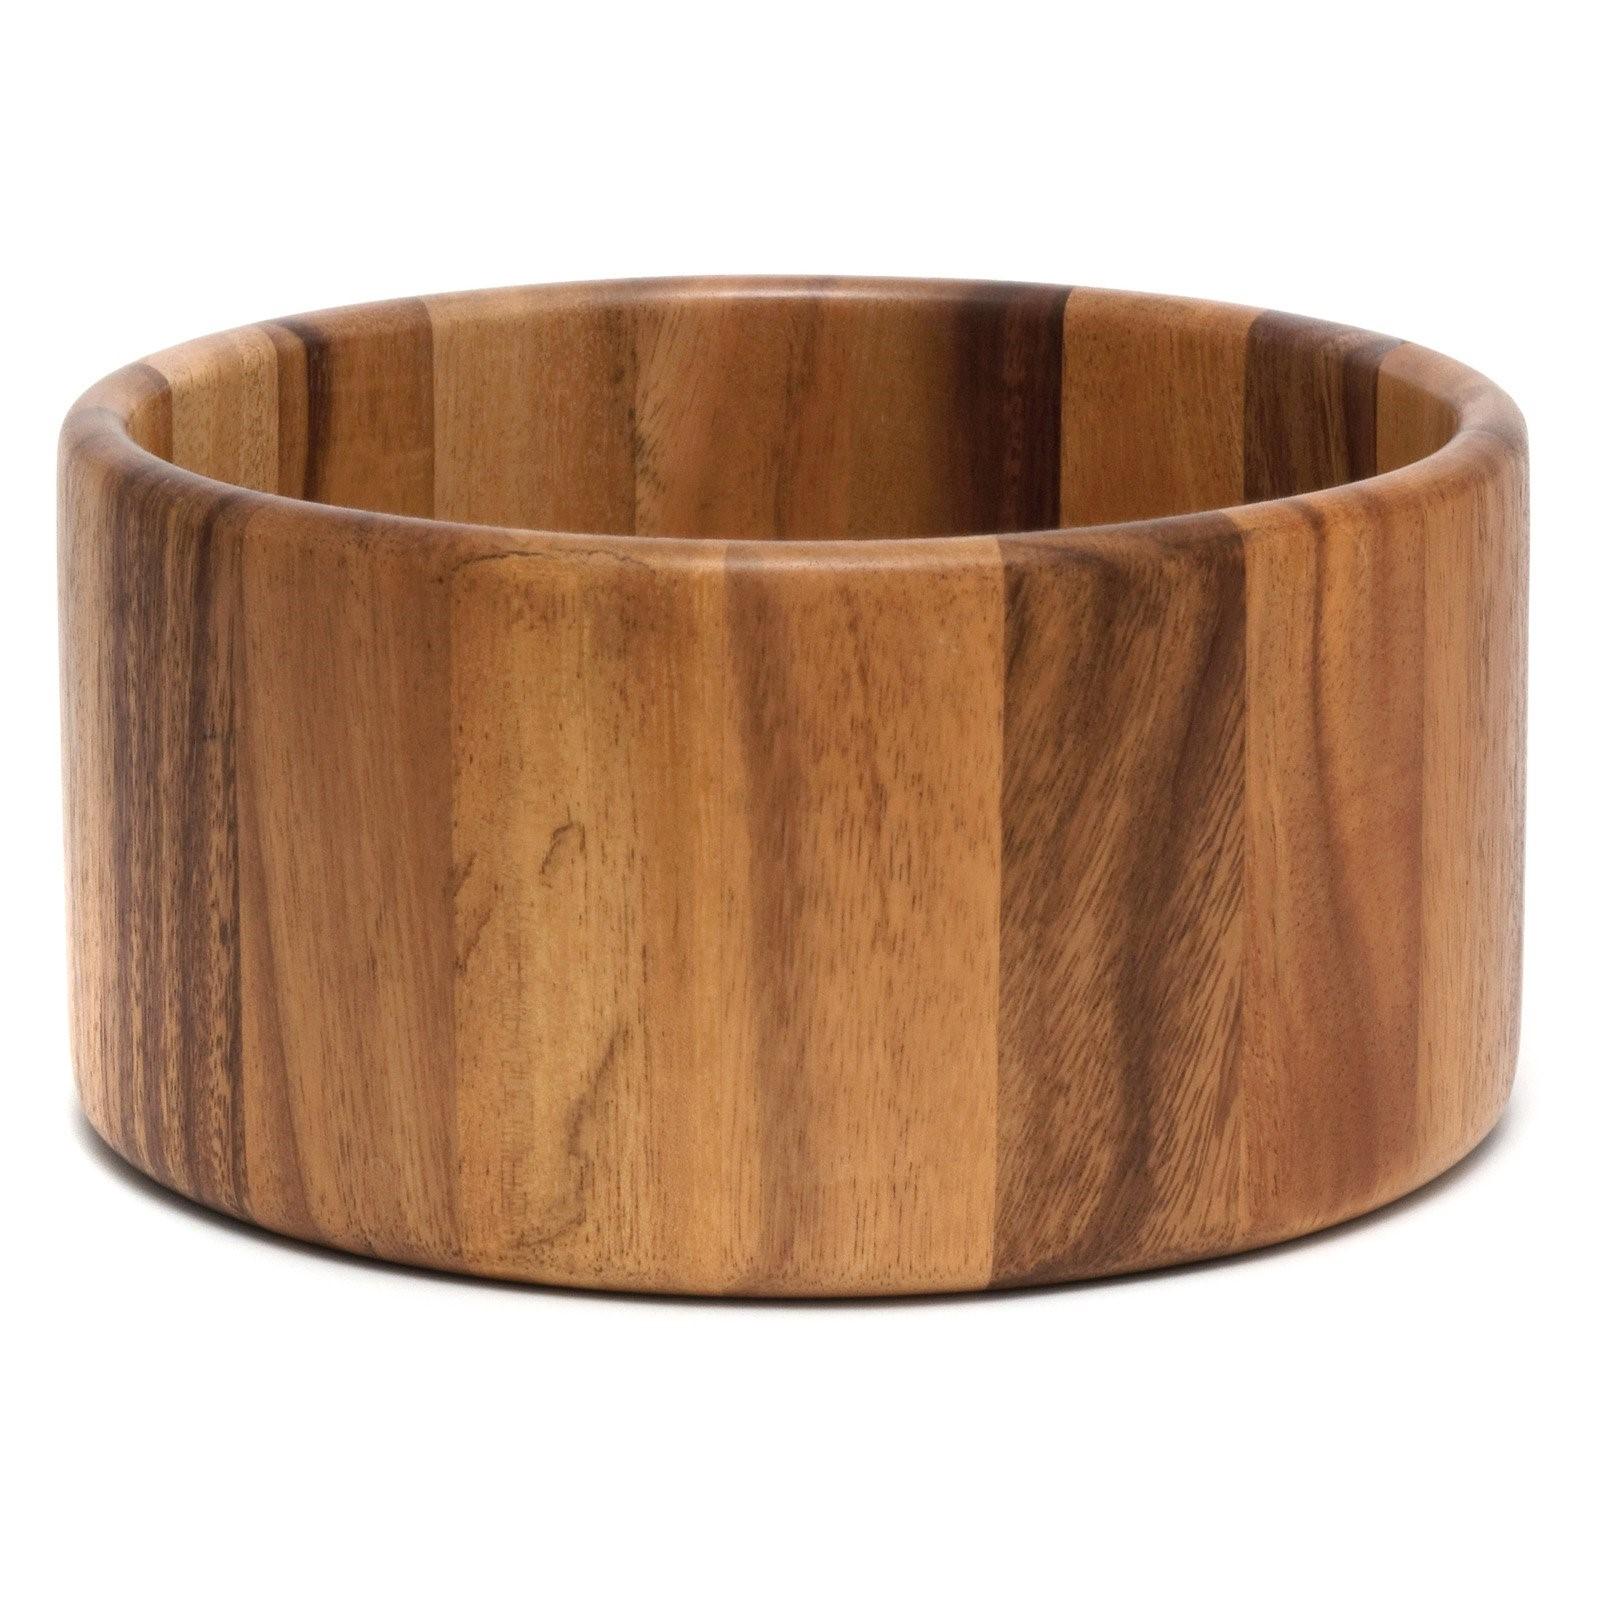 Lipper International Acacia 10 x 5 in. Straight Side Bowl